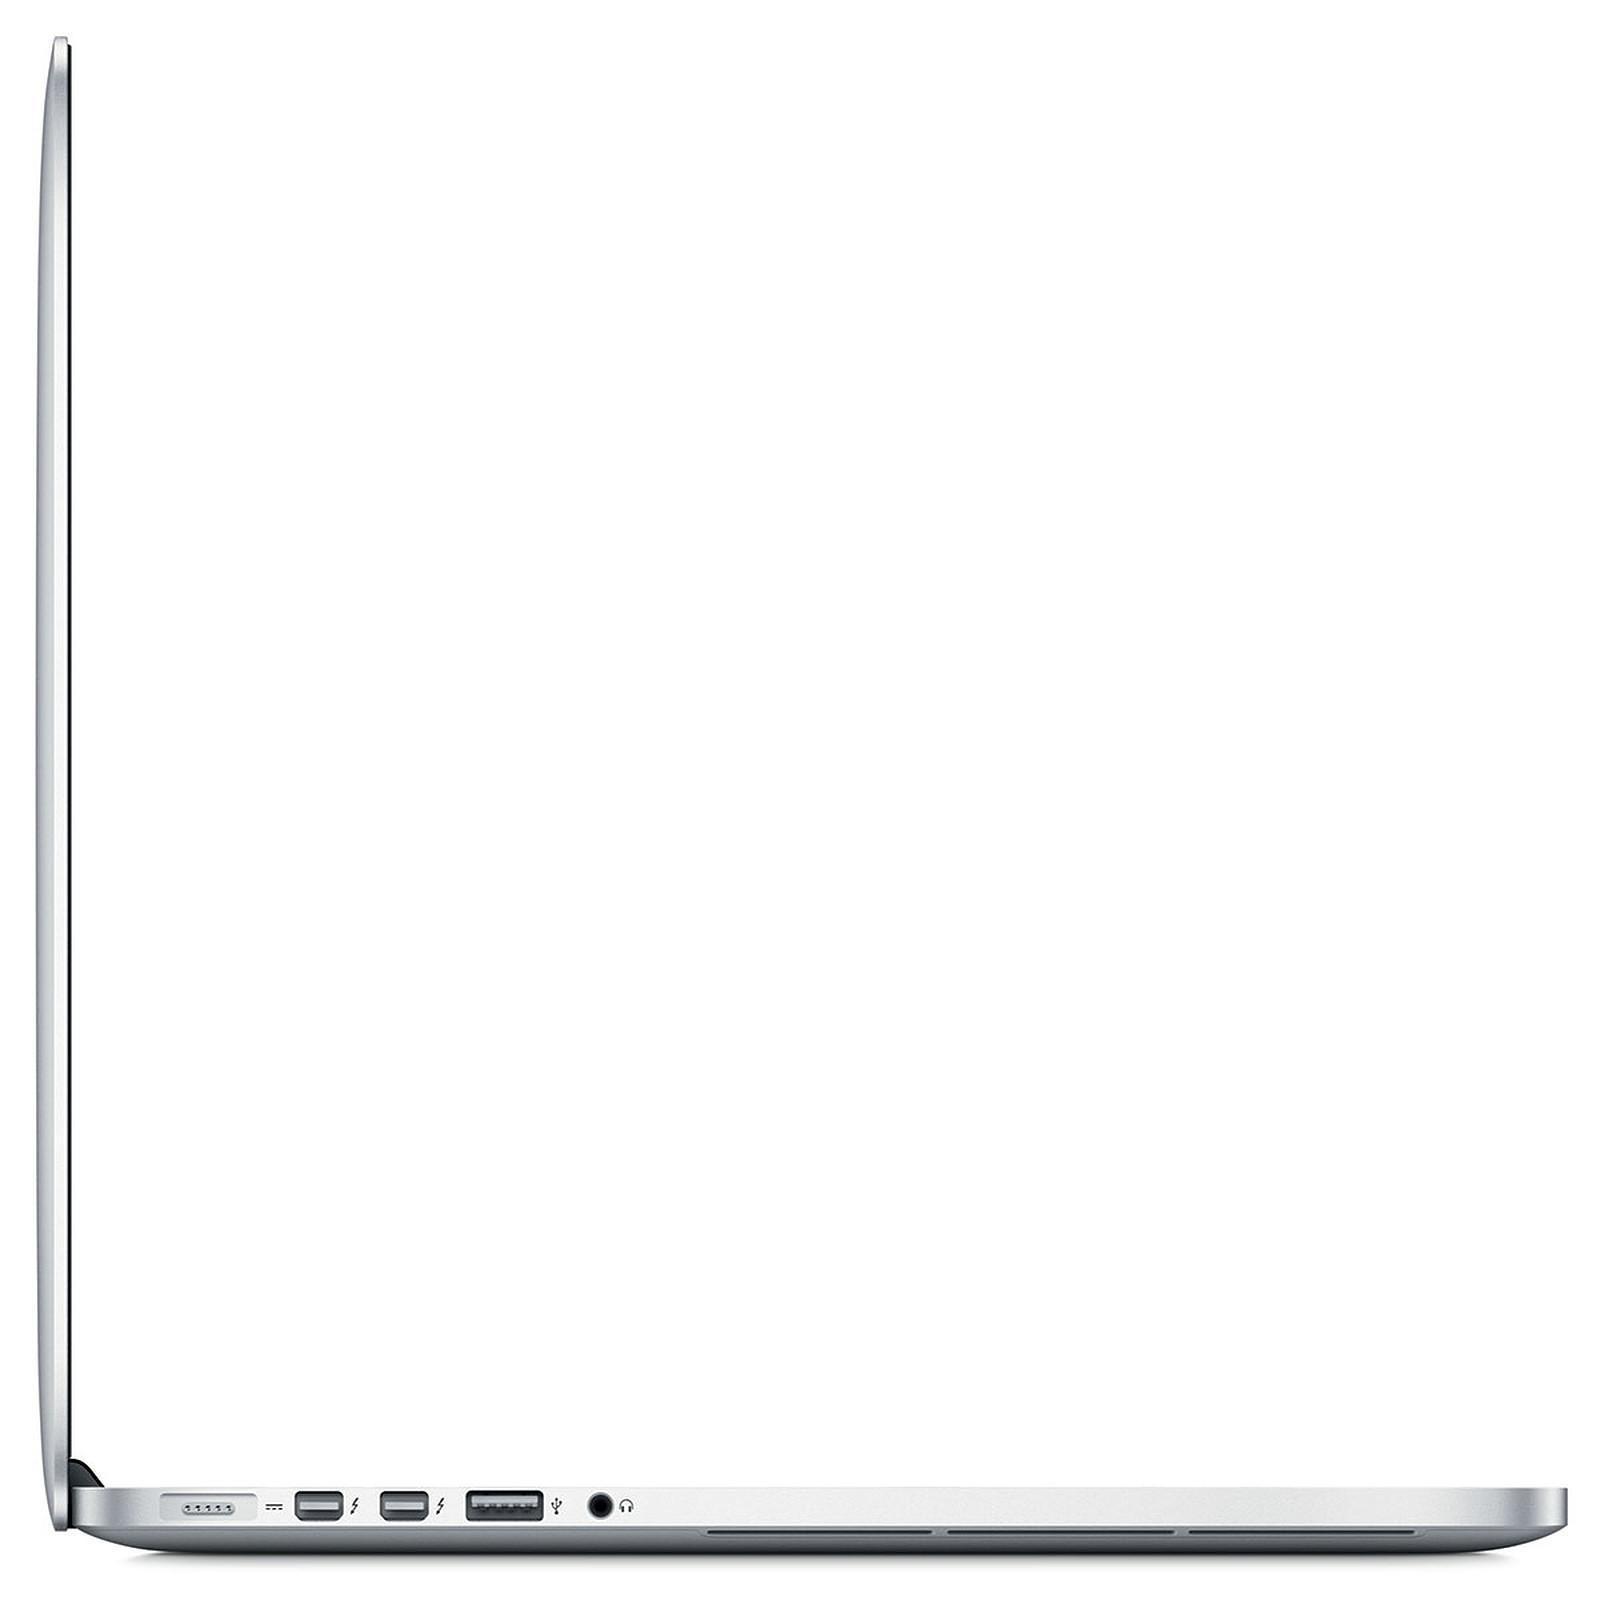 MacBook Pro Retina 15,4-tum (2013) - Core i7 - 16GB - SSD 512 GB QWERTY - Nederländska